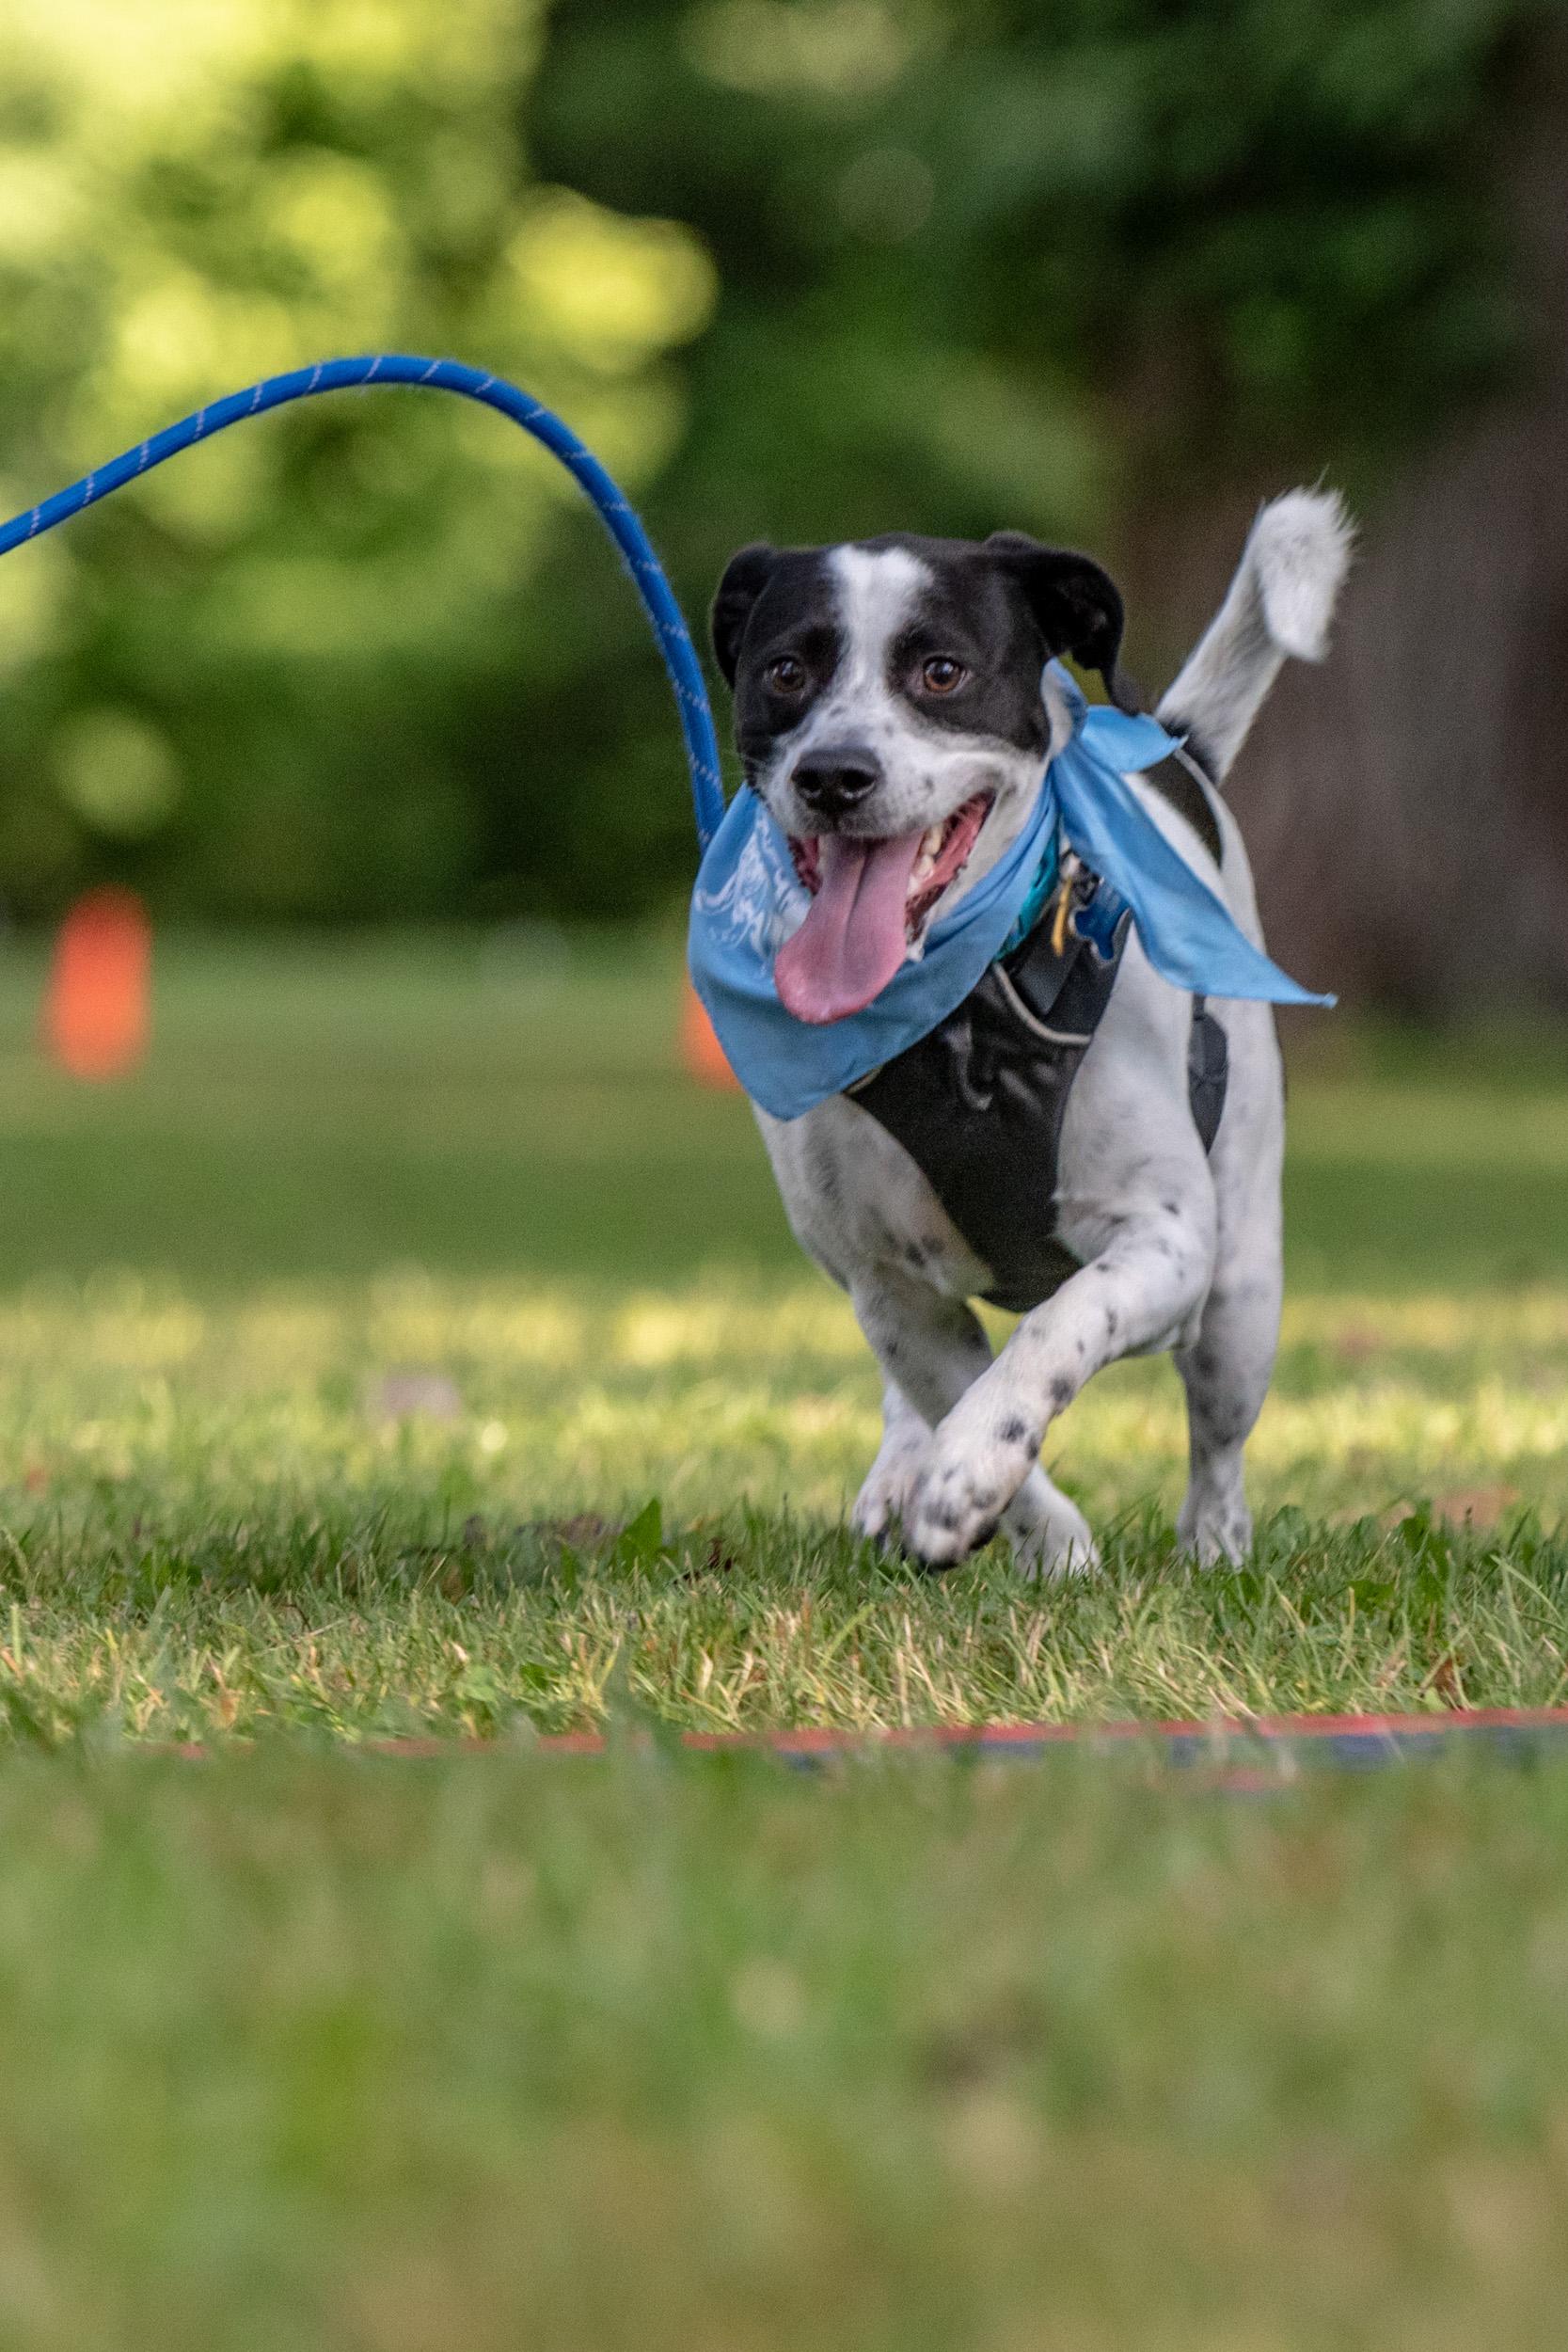 happy dog run - M's Animals Photography